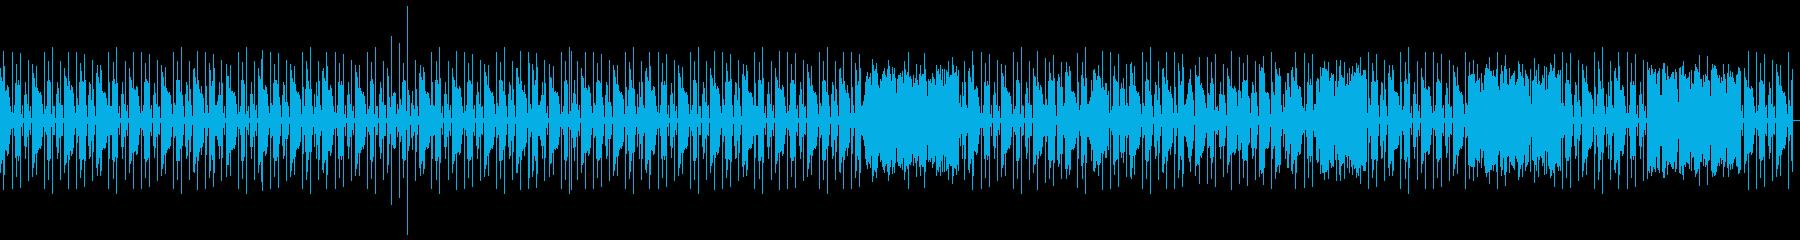 hiphop pianoの再生済みの波形